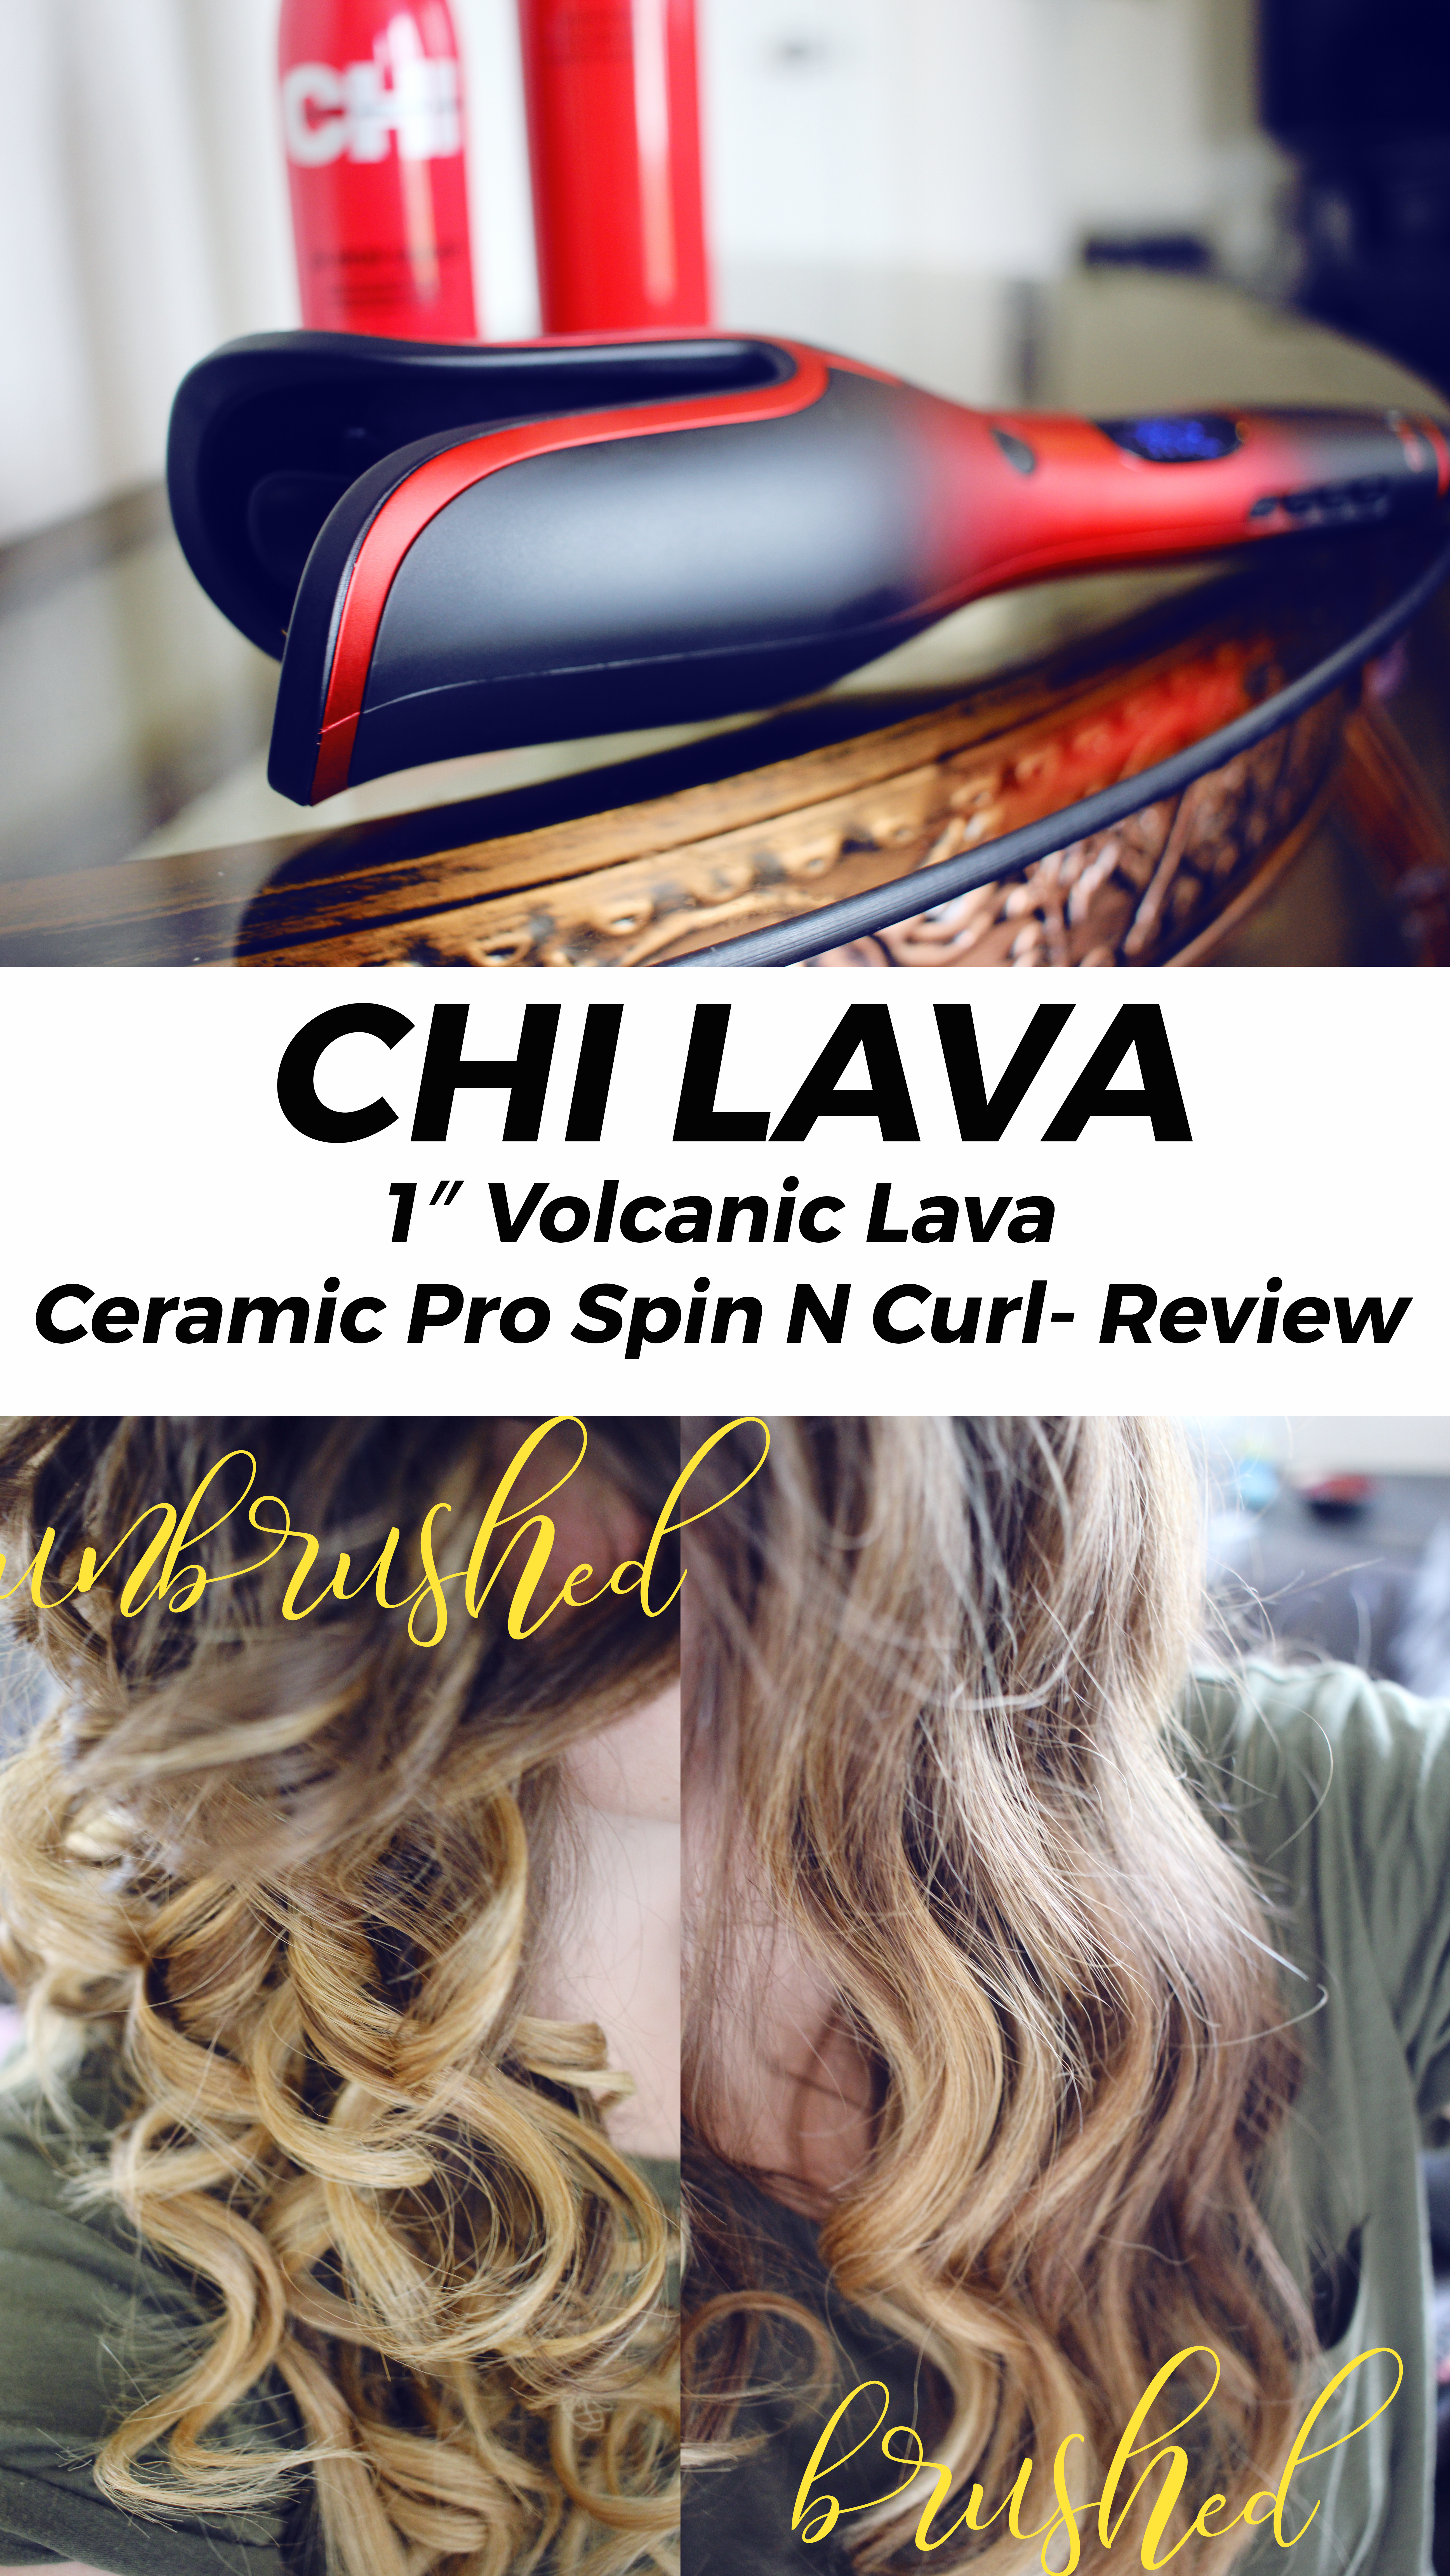 "Chi Lava 1"" Volcanic Lava Ceramic Pro Spin N Curl"